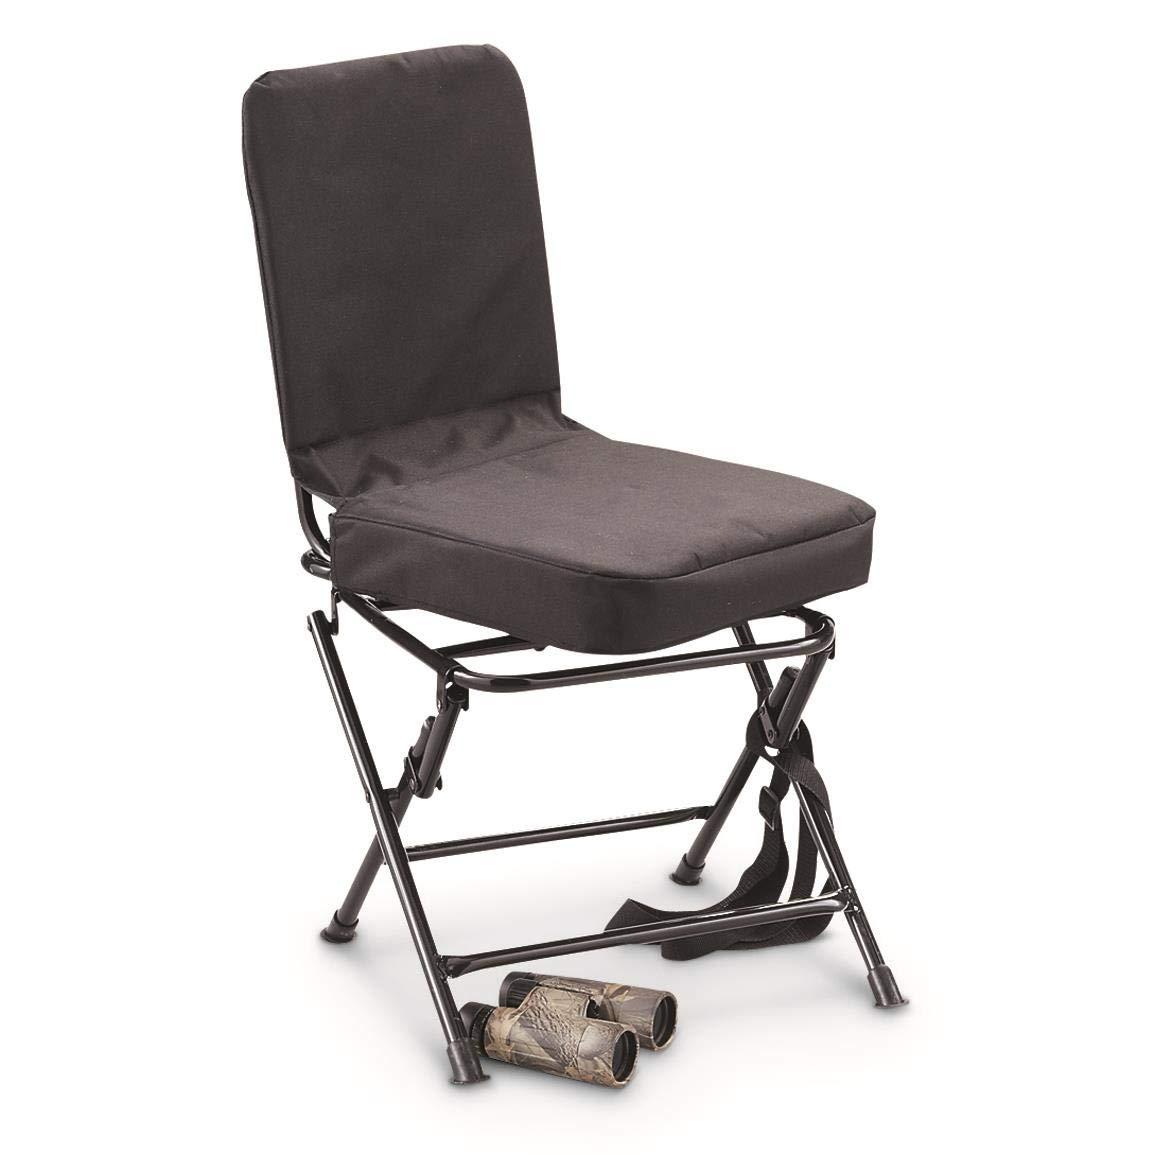 Swivel Hunting Chair Blind Seat Folding 360 Degree ...